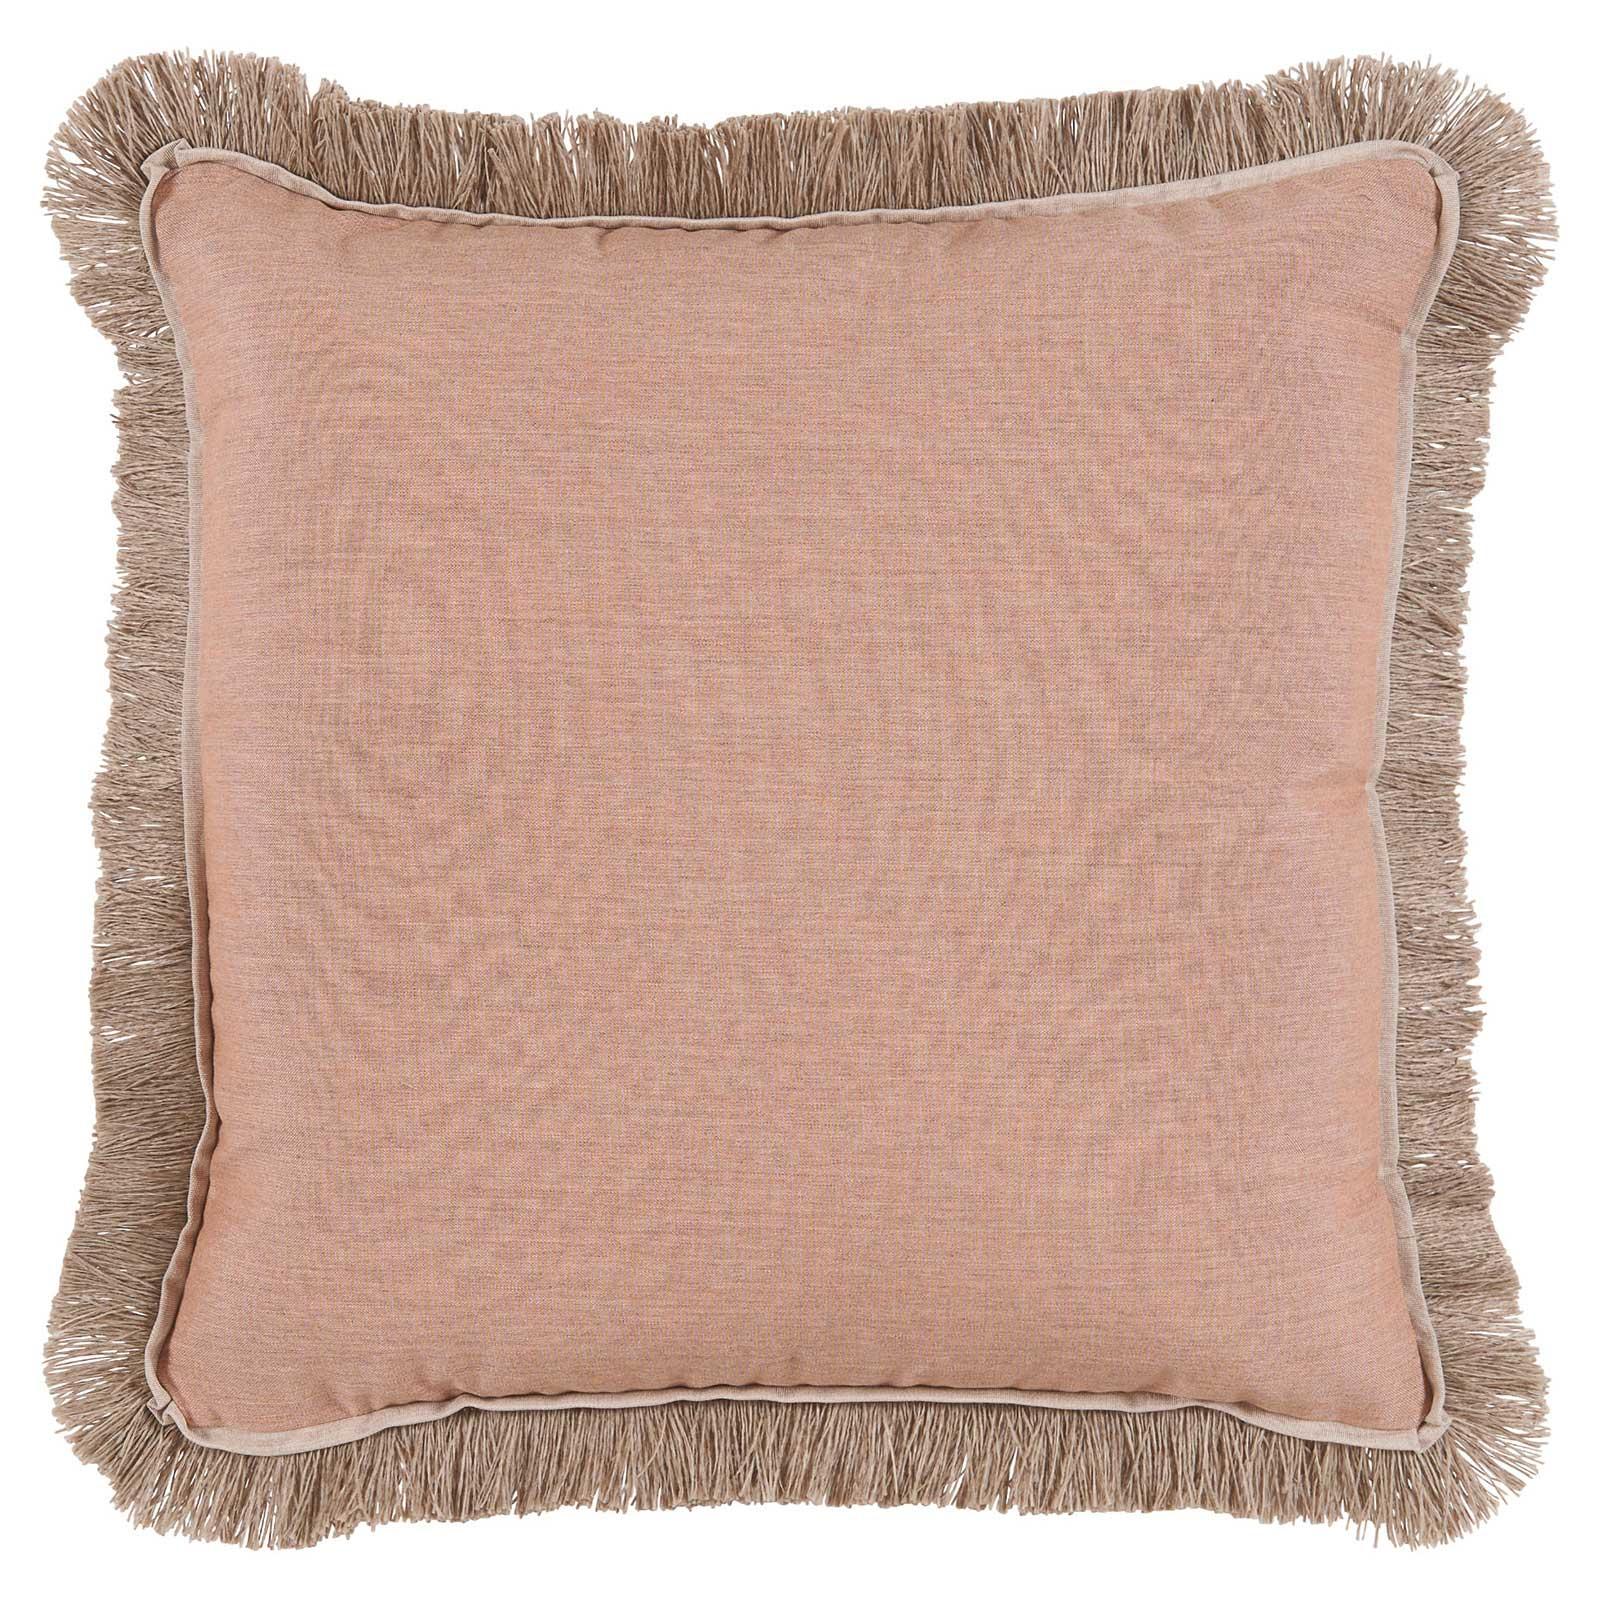 Talli Regency Fringe Rose Outdoor Pillow - 20x20